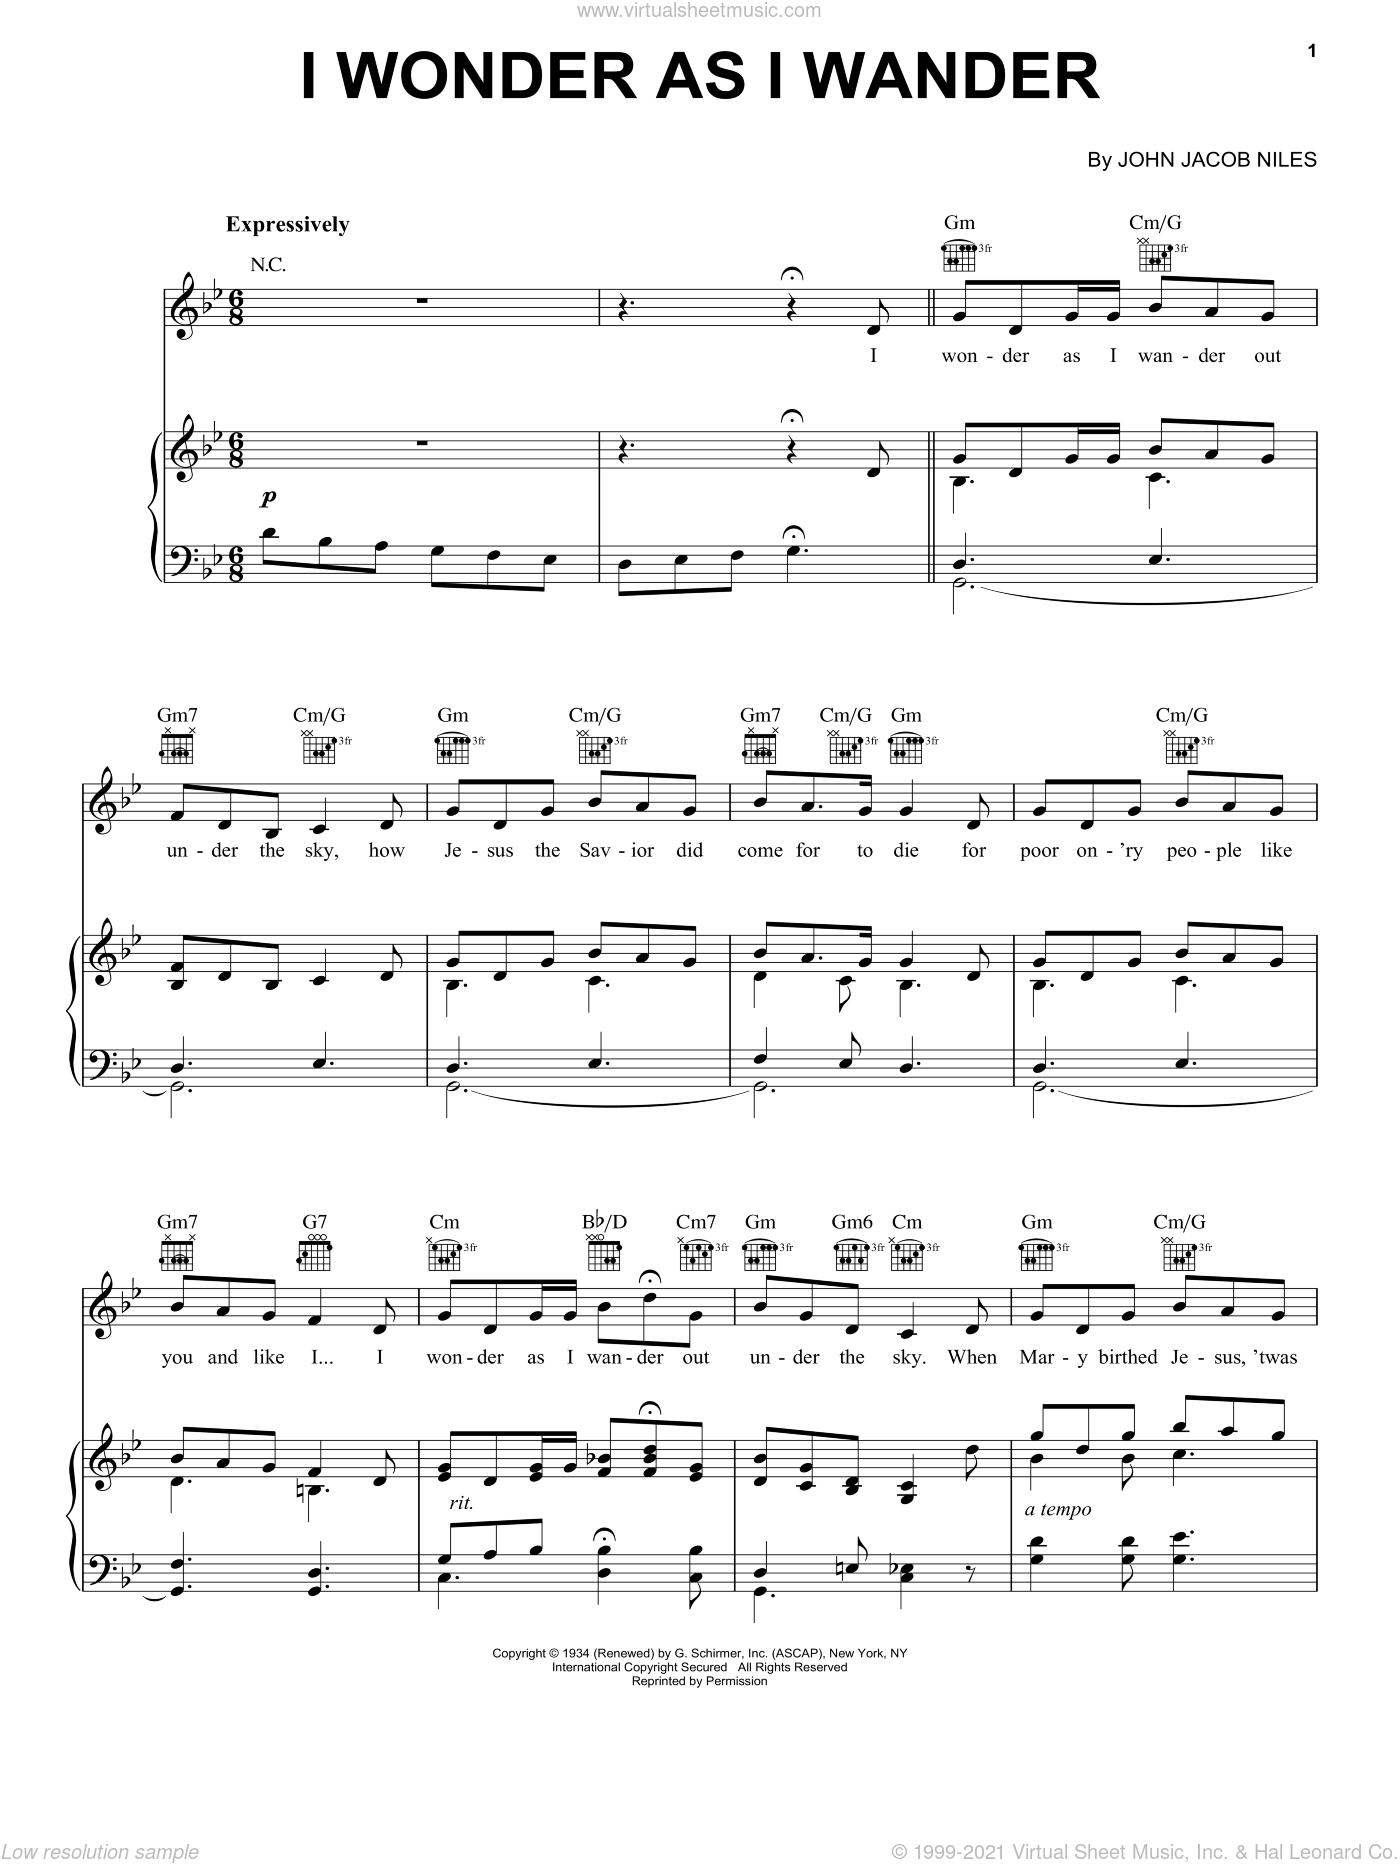 I Wonder As I Wander sheet music for voice, piano or guitar by John Jacob Niles, intermediate skill level